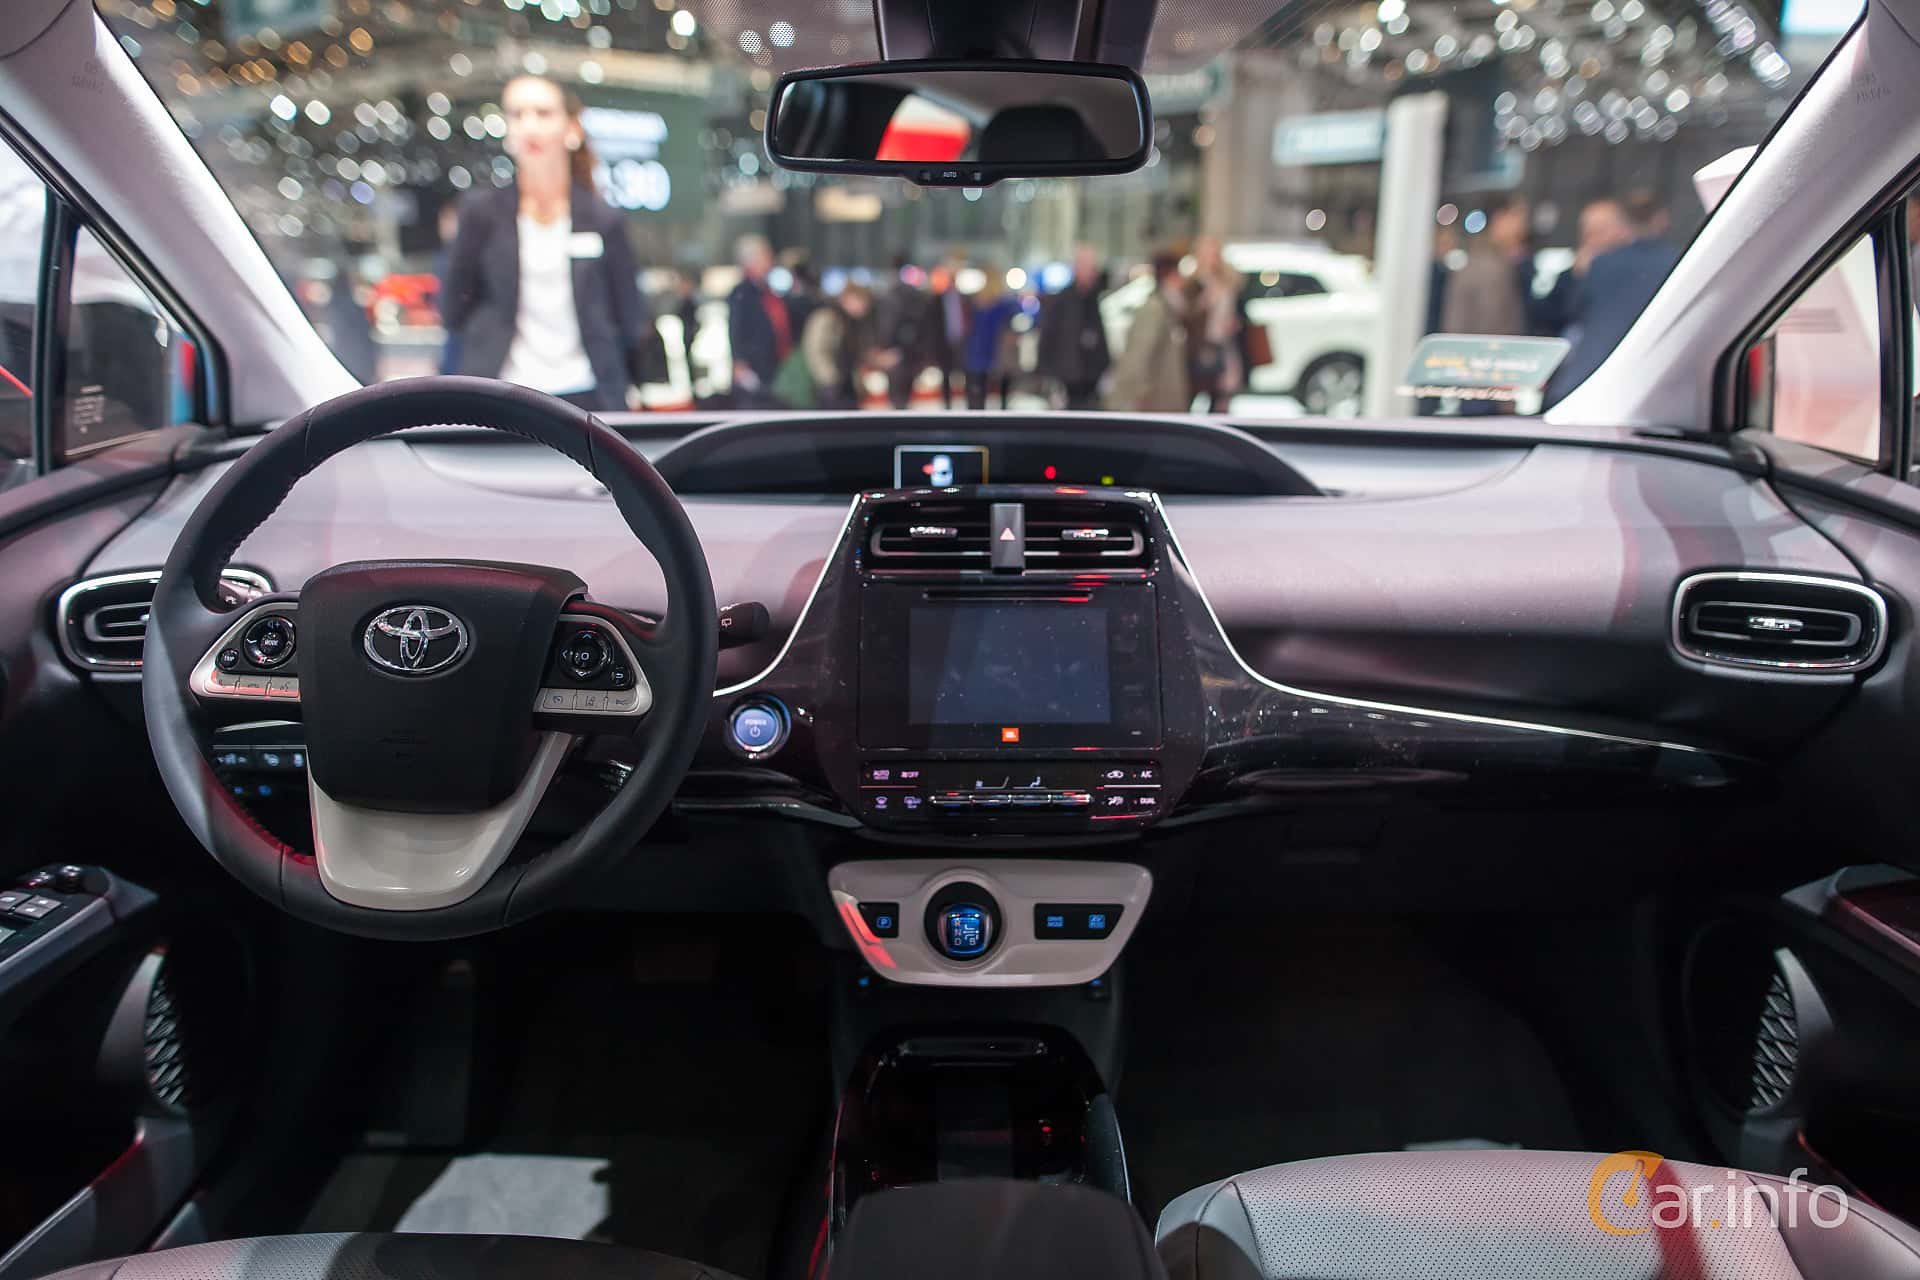 Tagen P Geneva Motor Show 2017 Toyota Prius Interior Sebastianjohansson